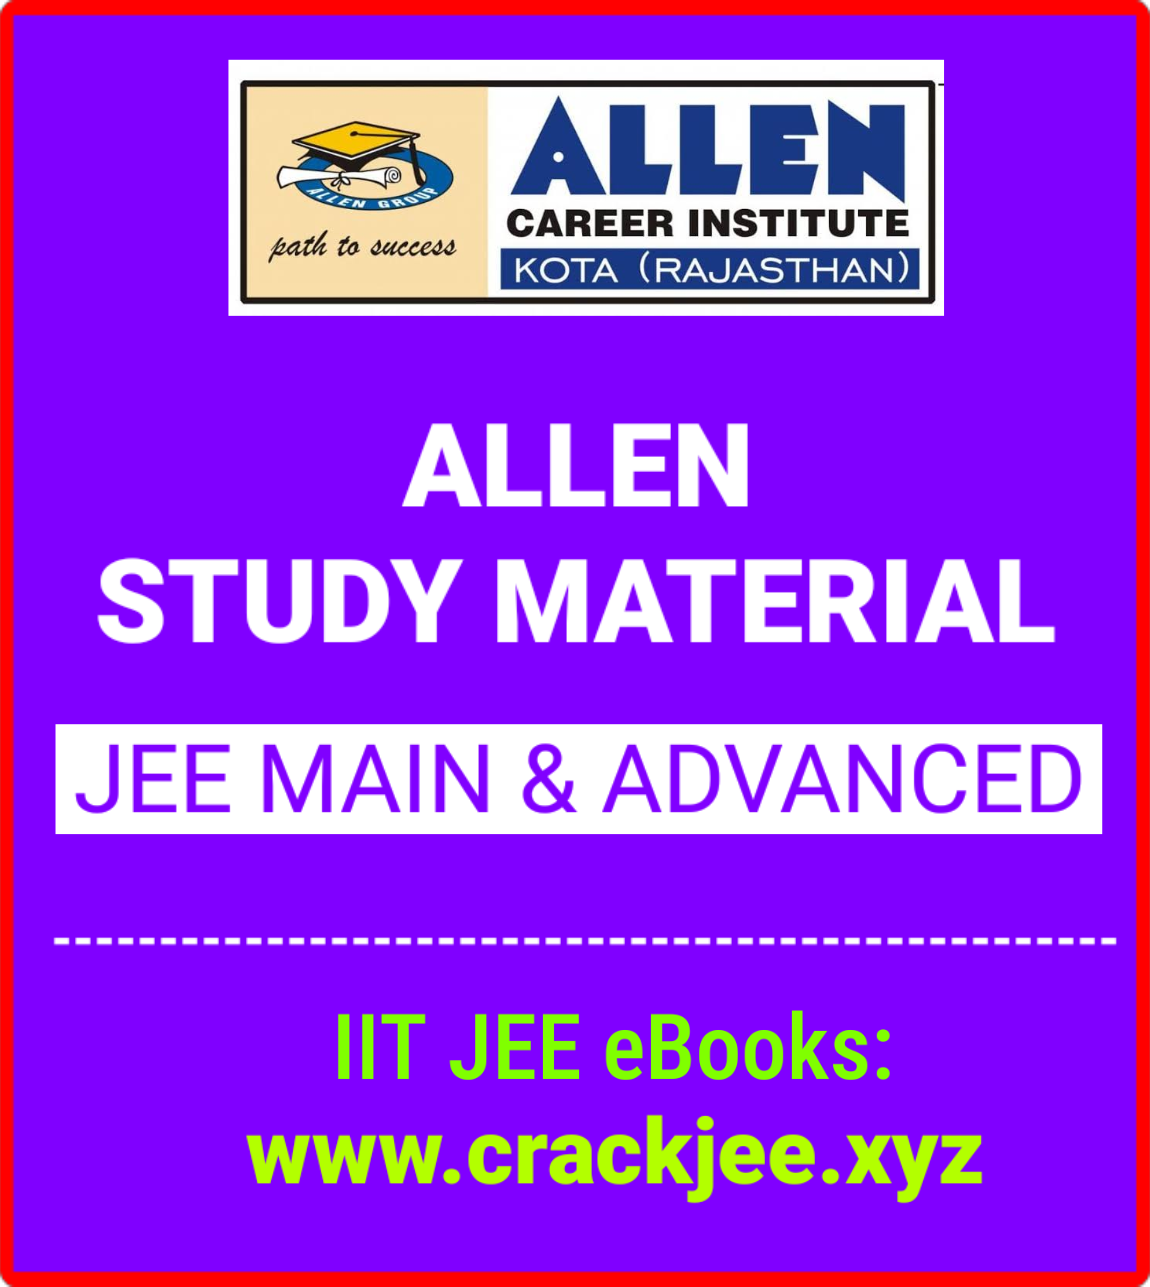 allen study material for iit jee free download